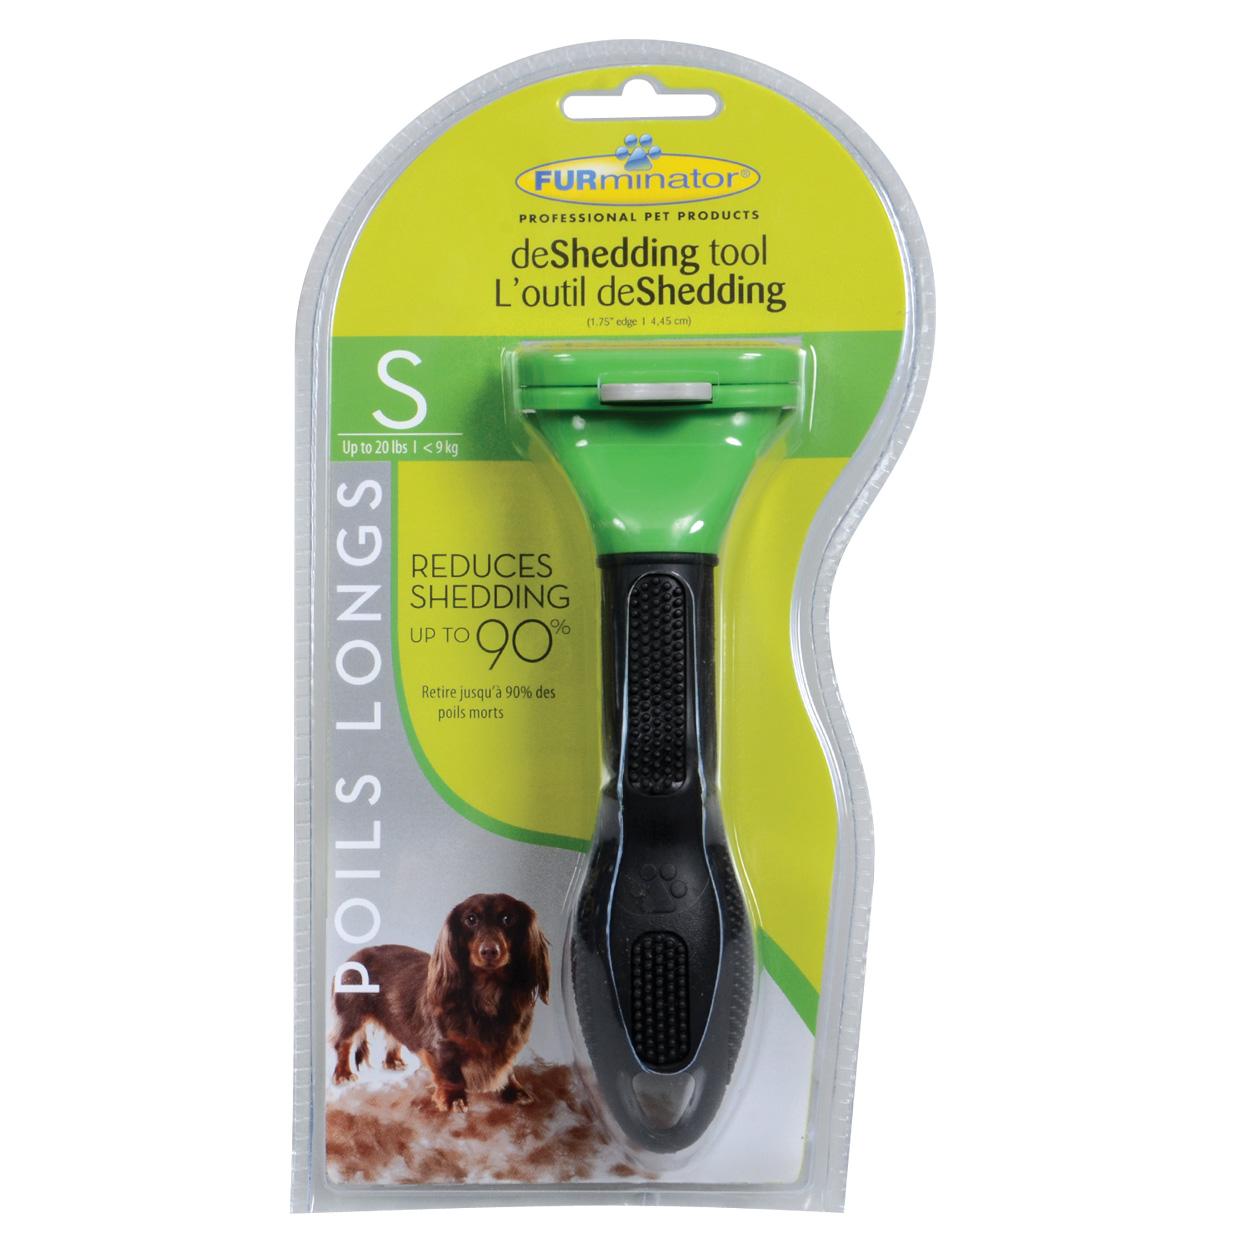 "FURminator Long Hair deShedding Tool for Dogs - S - 1.75"" 10748"